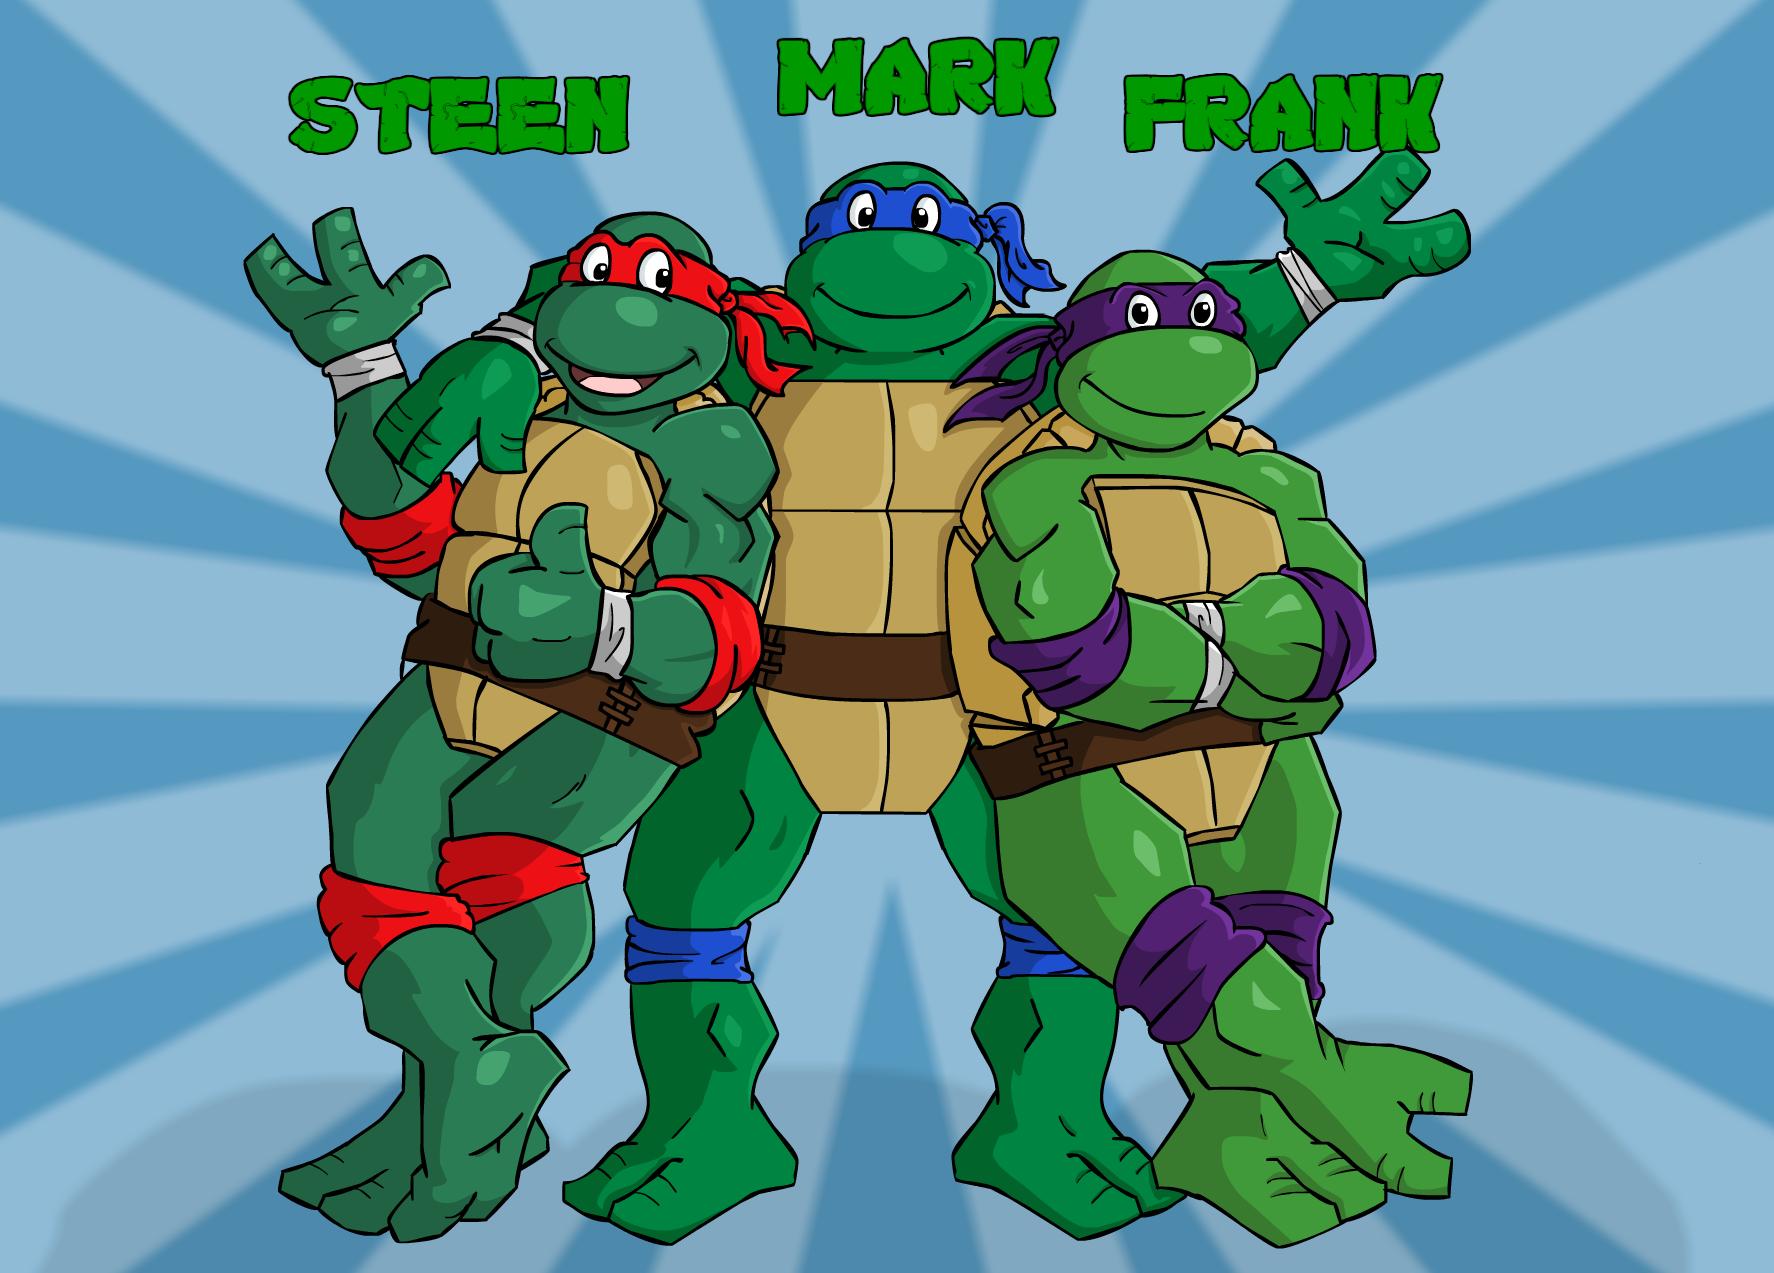 Ninja Turtles piece